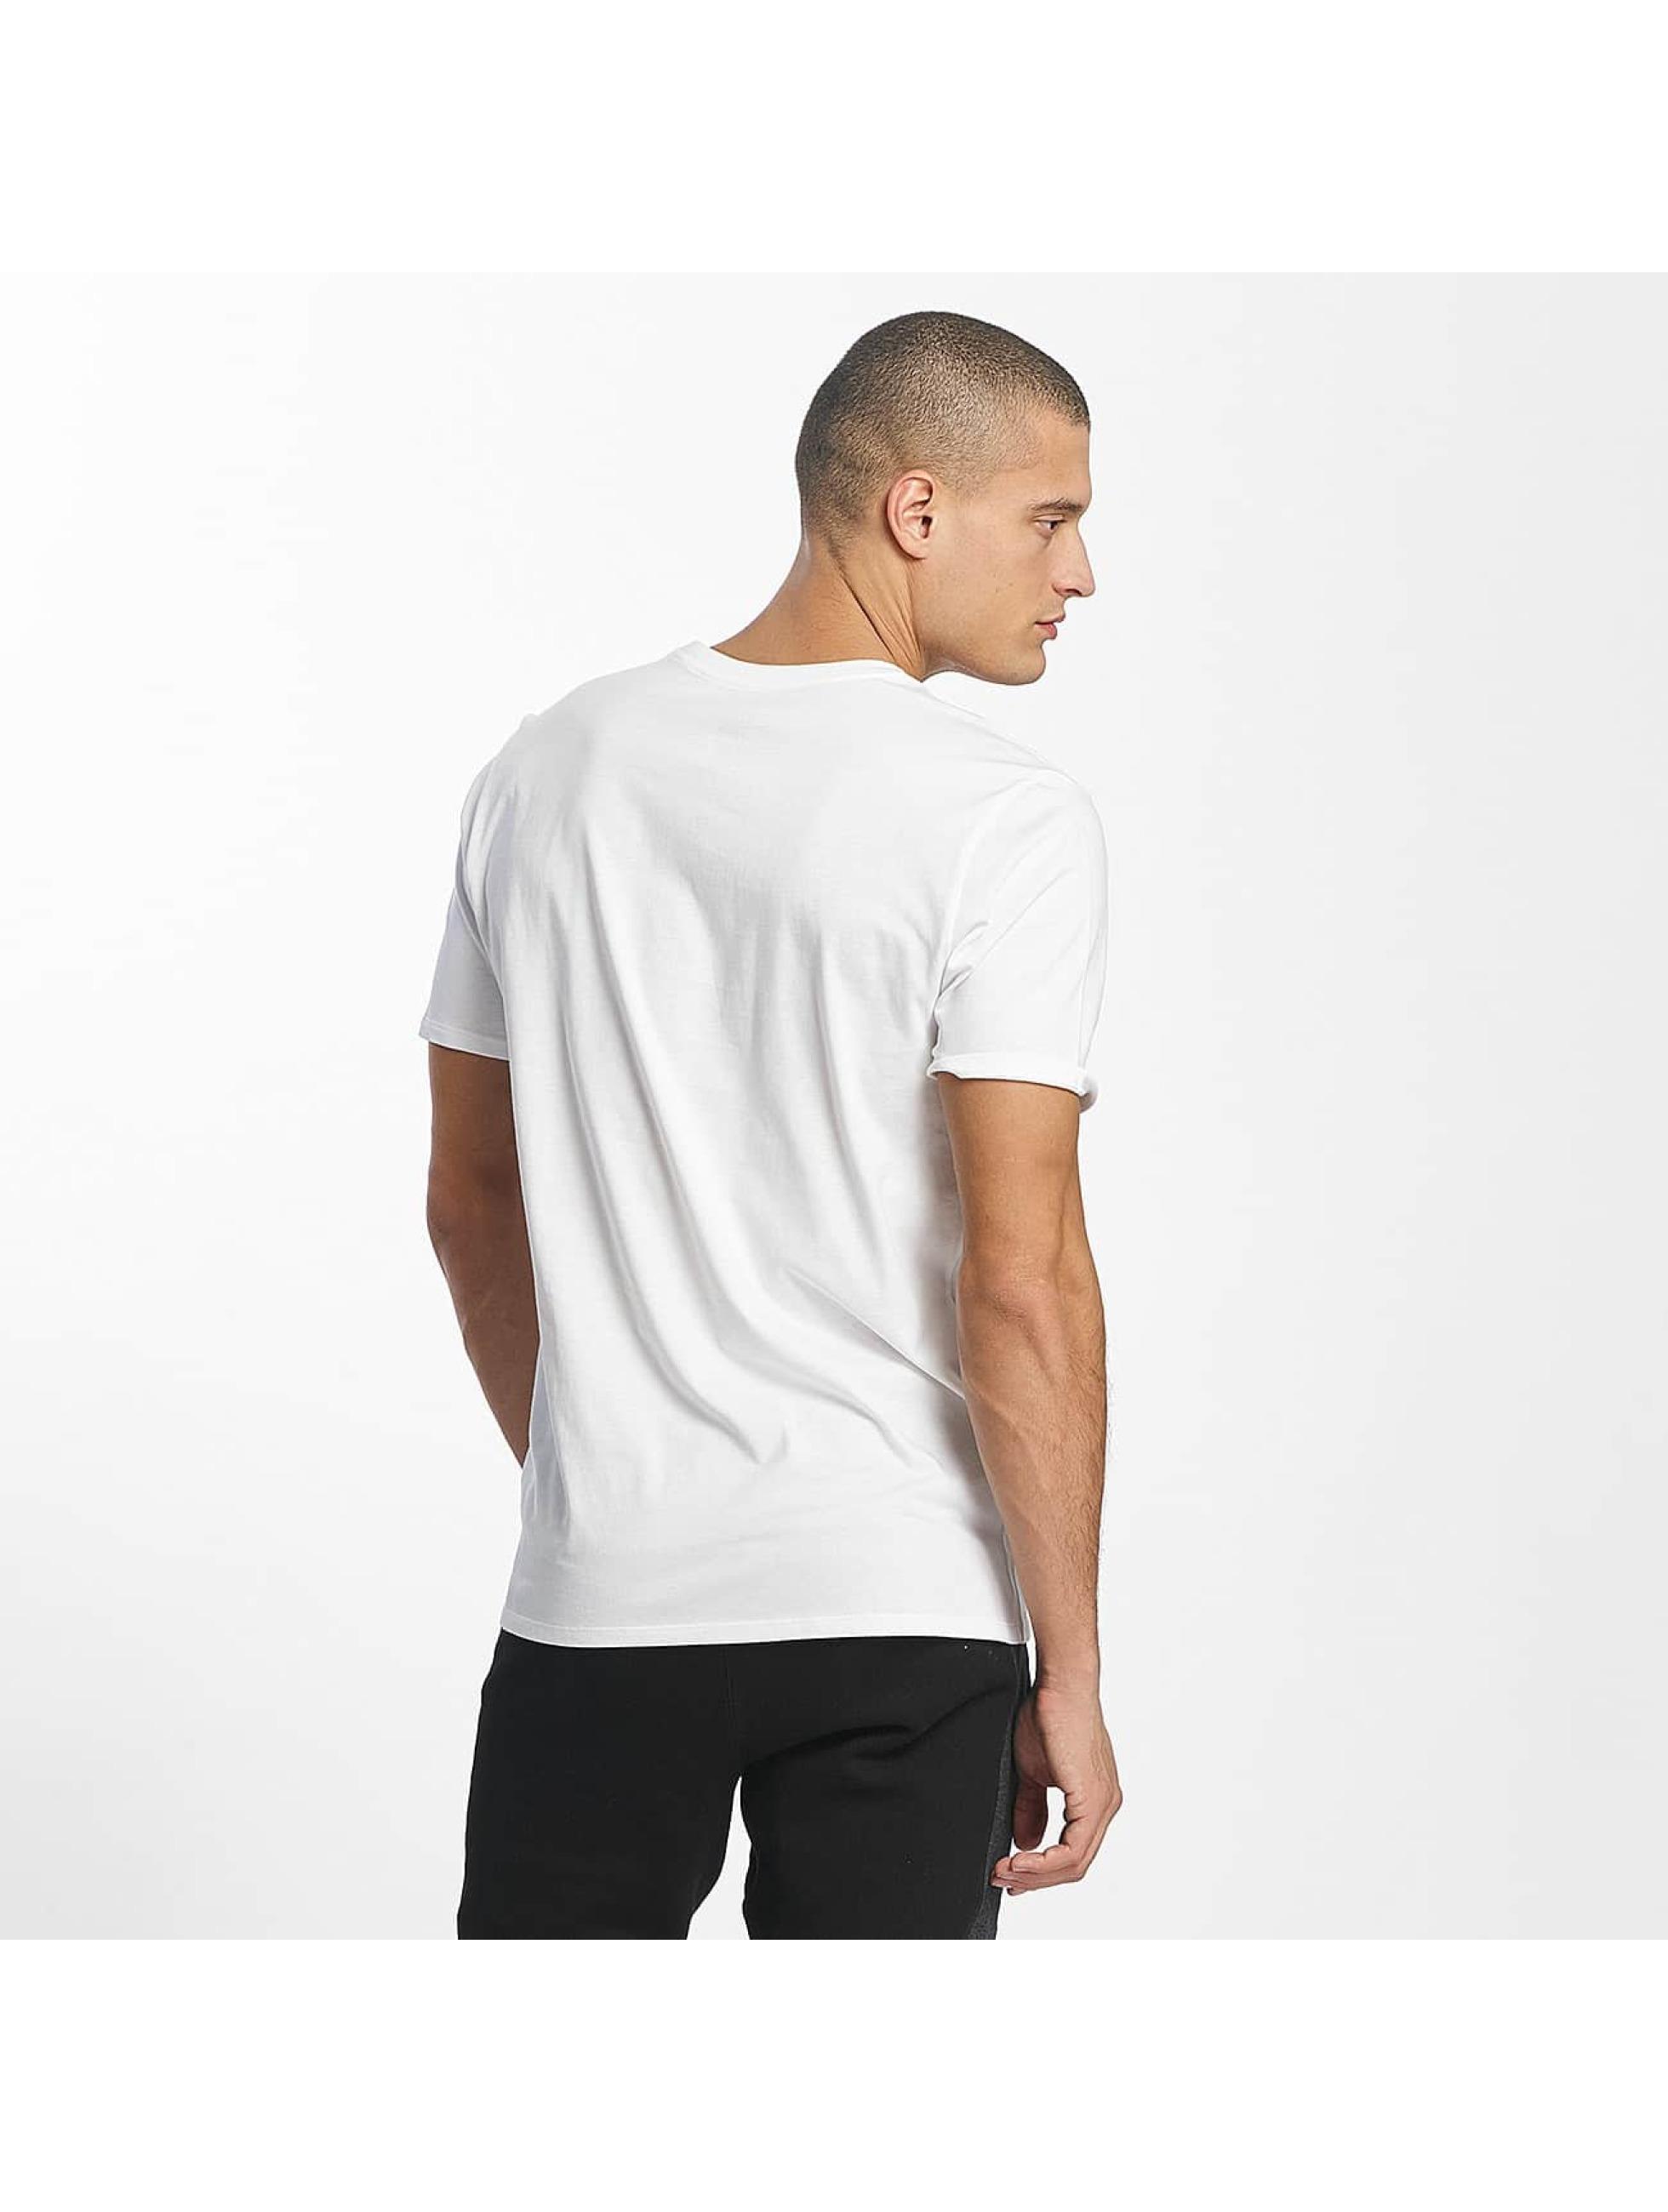 nike jsw brand 6 blanc homme t shirt nike acheter pas cher haut 365508. Black Bedroom Furniture Sets. Home Design Ideas